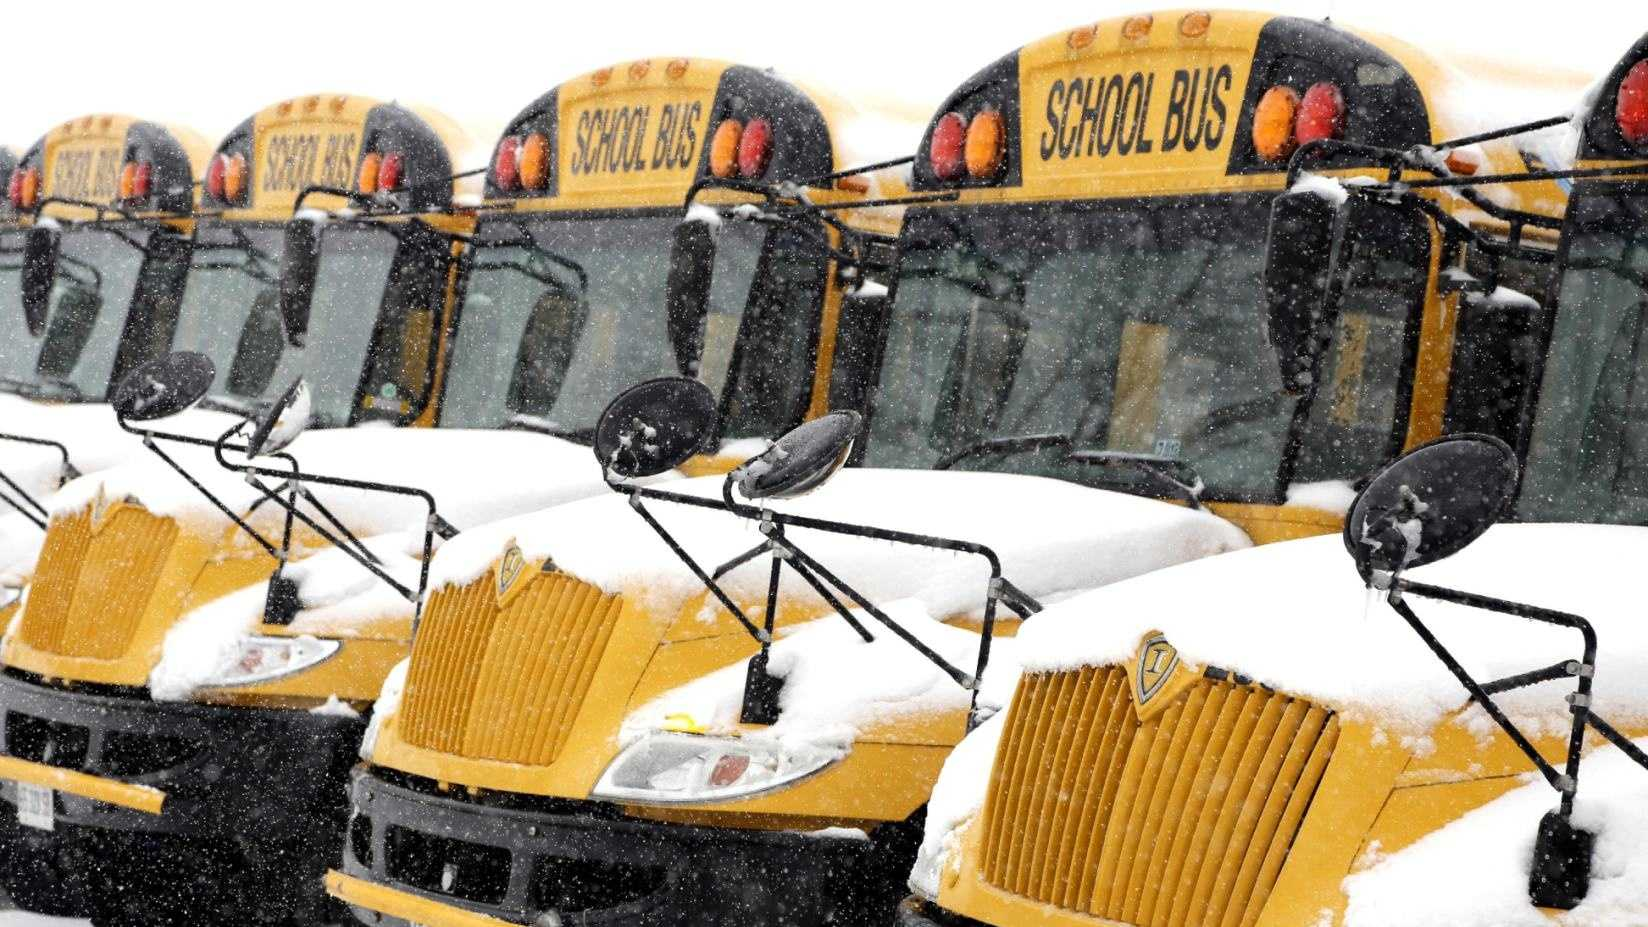 School Buses with Snow 0203.jpg